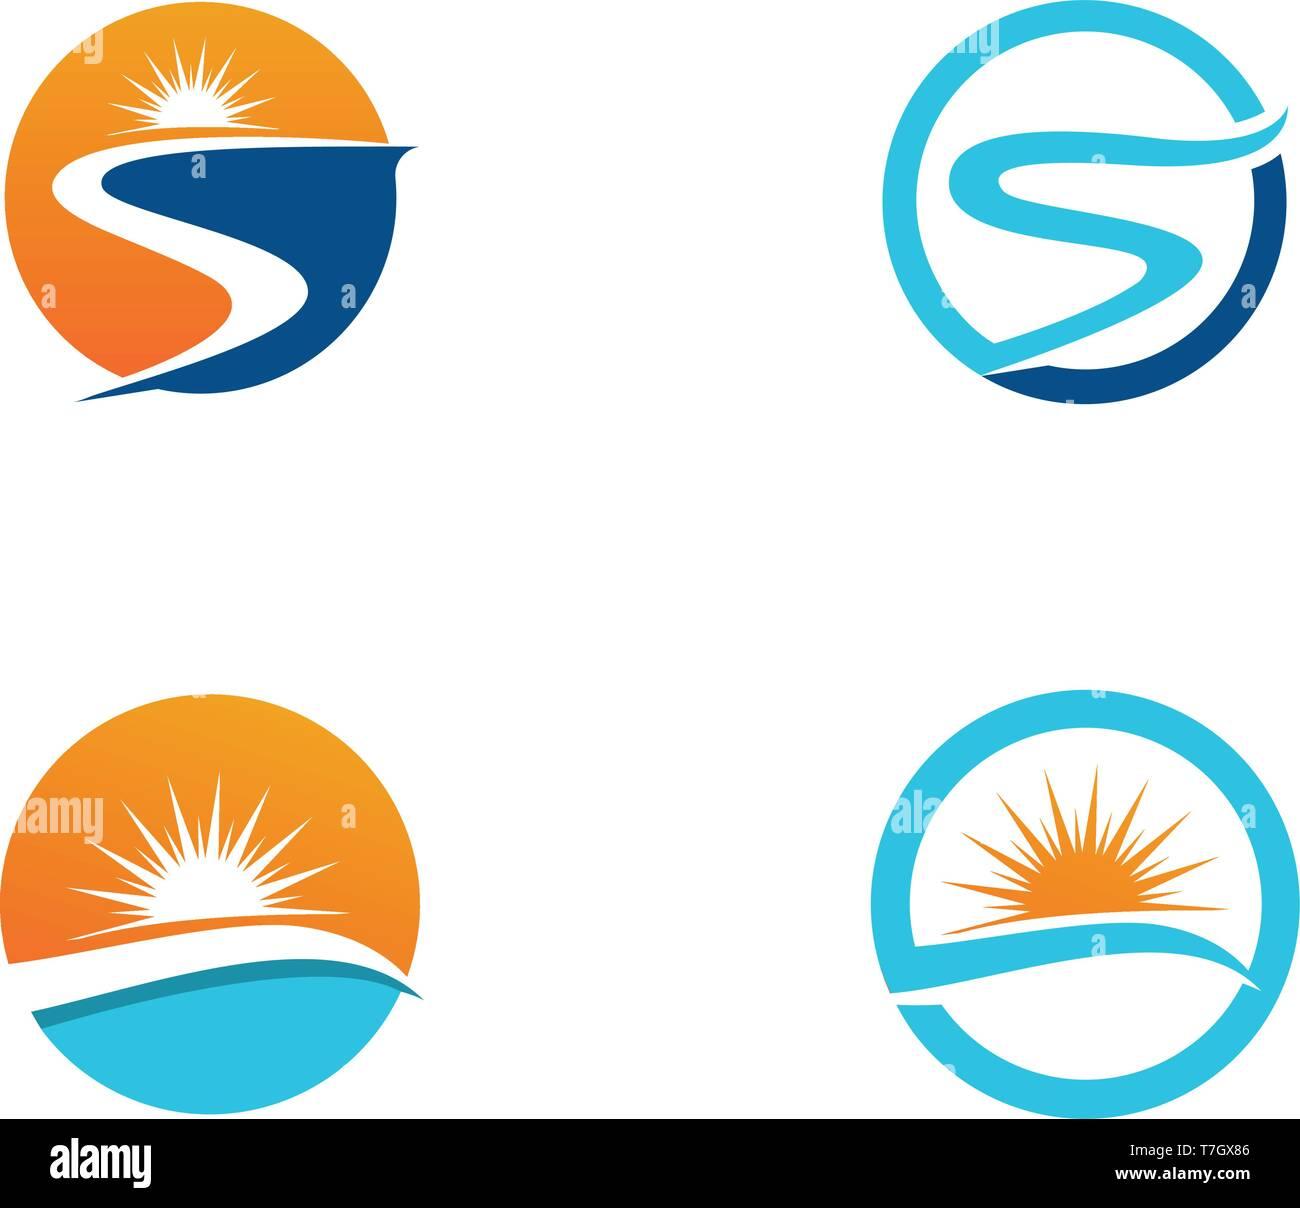 river logo template vector icon illustration app stock vector image art alamy alamy